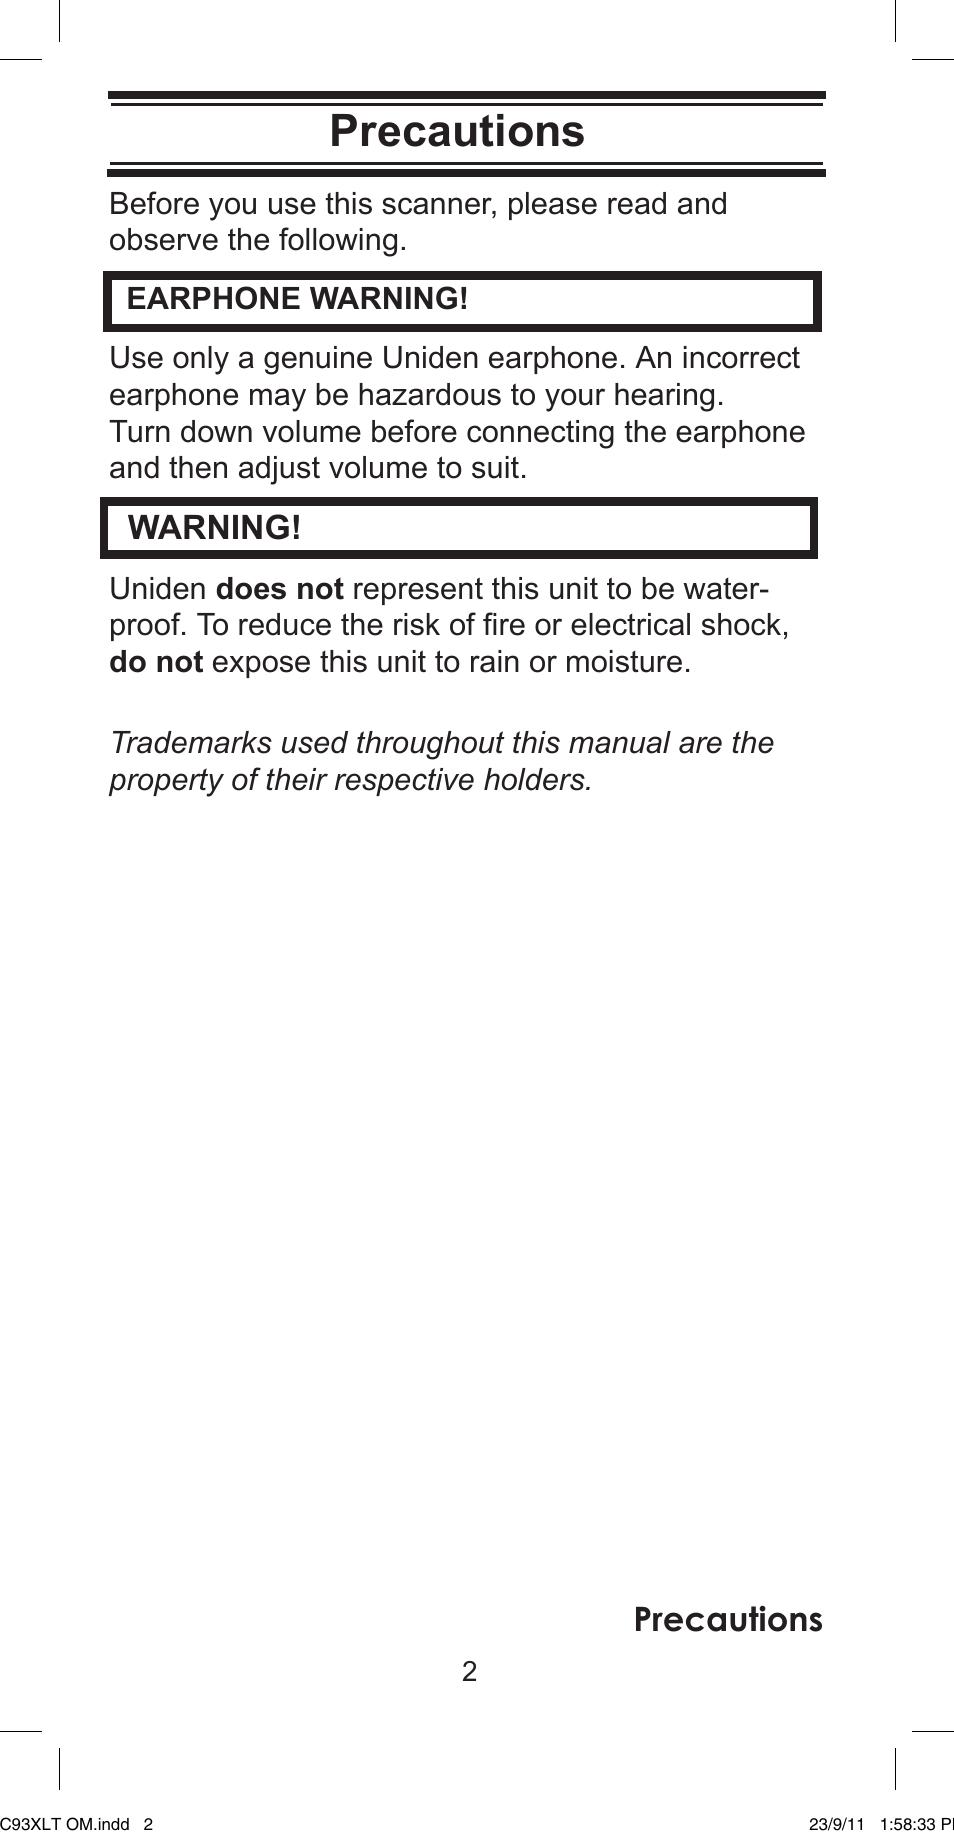 precautions warning uniden ubc93xlt user manual page 2 60 rh manualsdir com